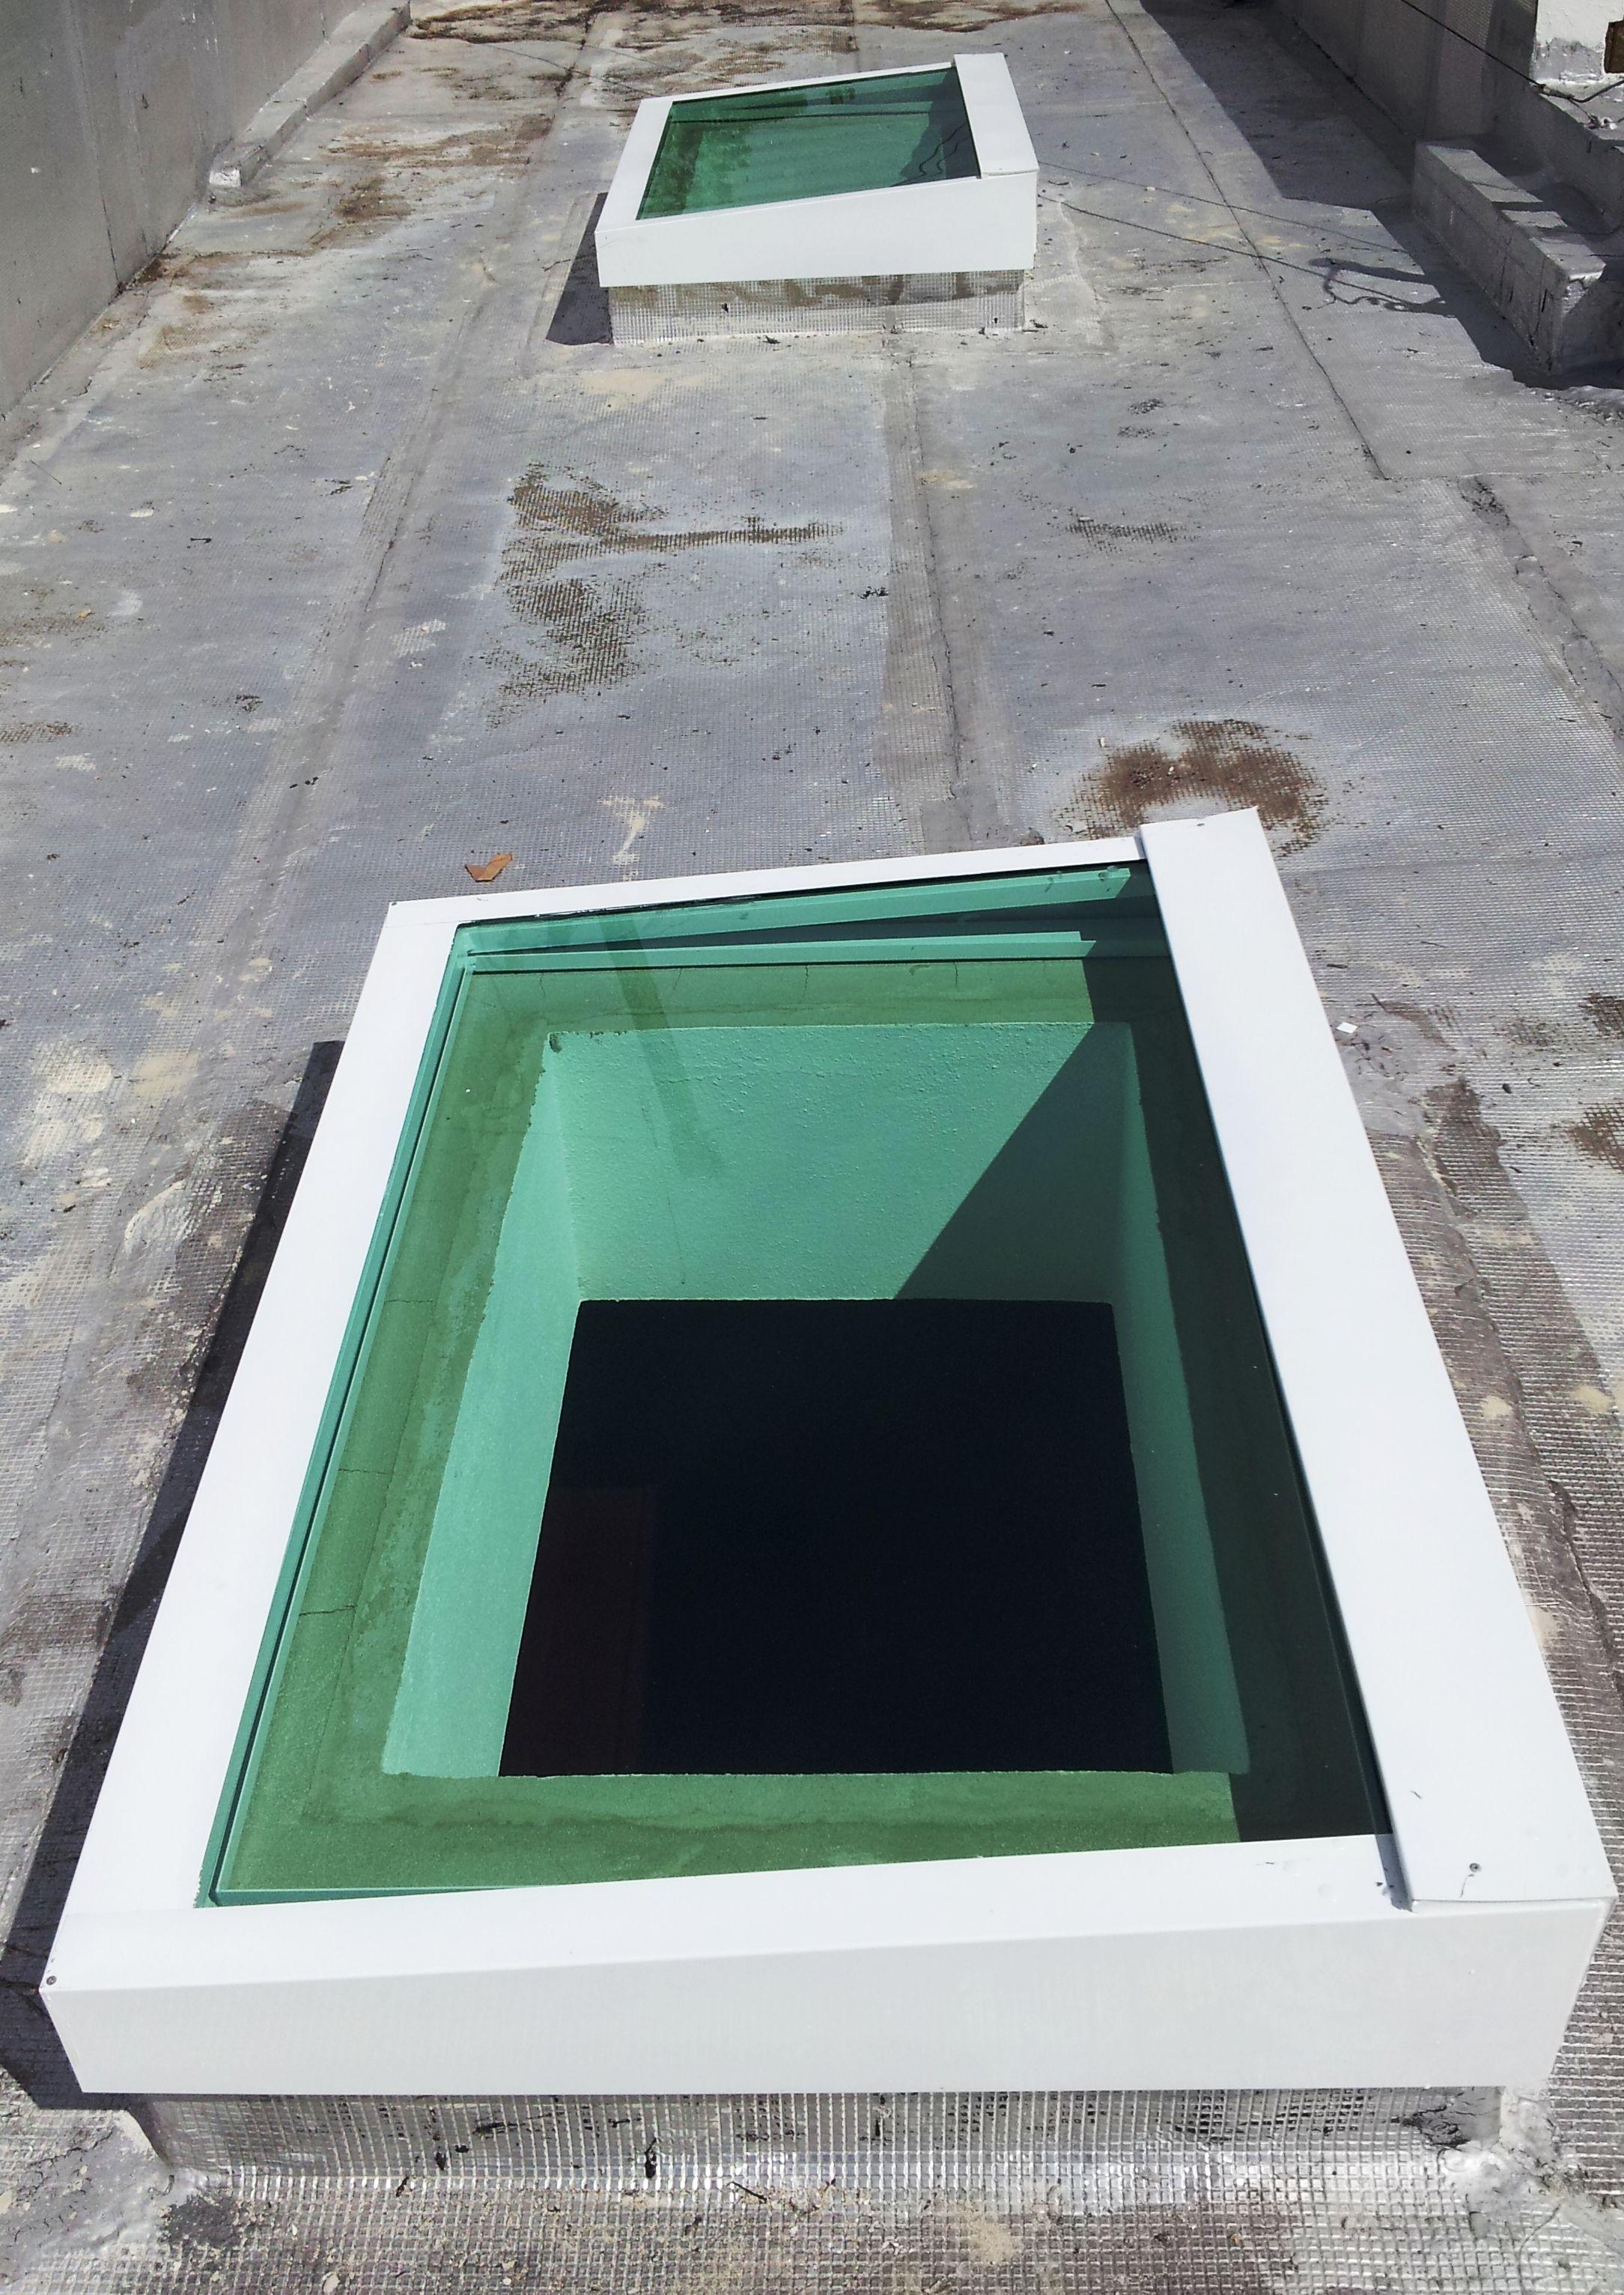 Doble tragaluz en un agua sobre marquesina aluminio blanco y cristal blue green 9 16 contra - Cortinas para tragaluz ...